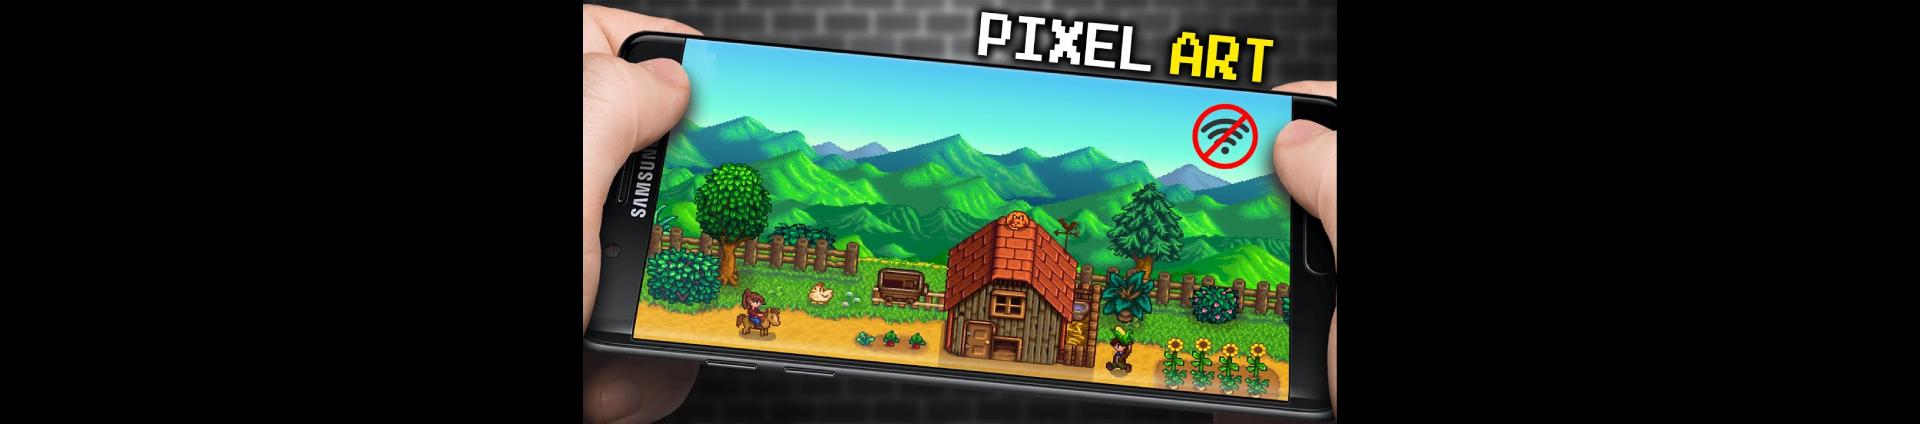 Pixel Art Games